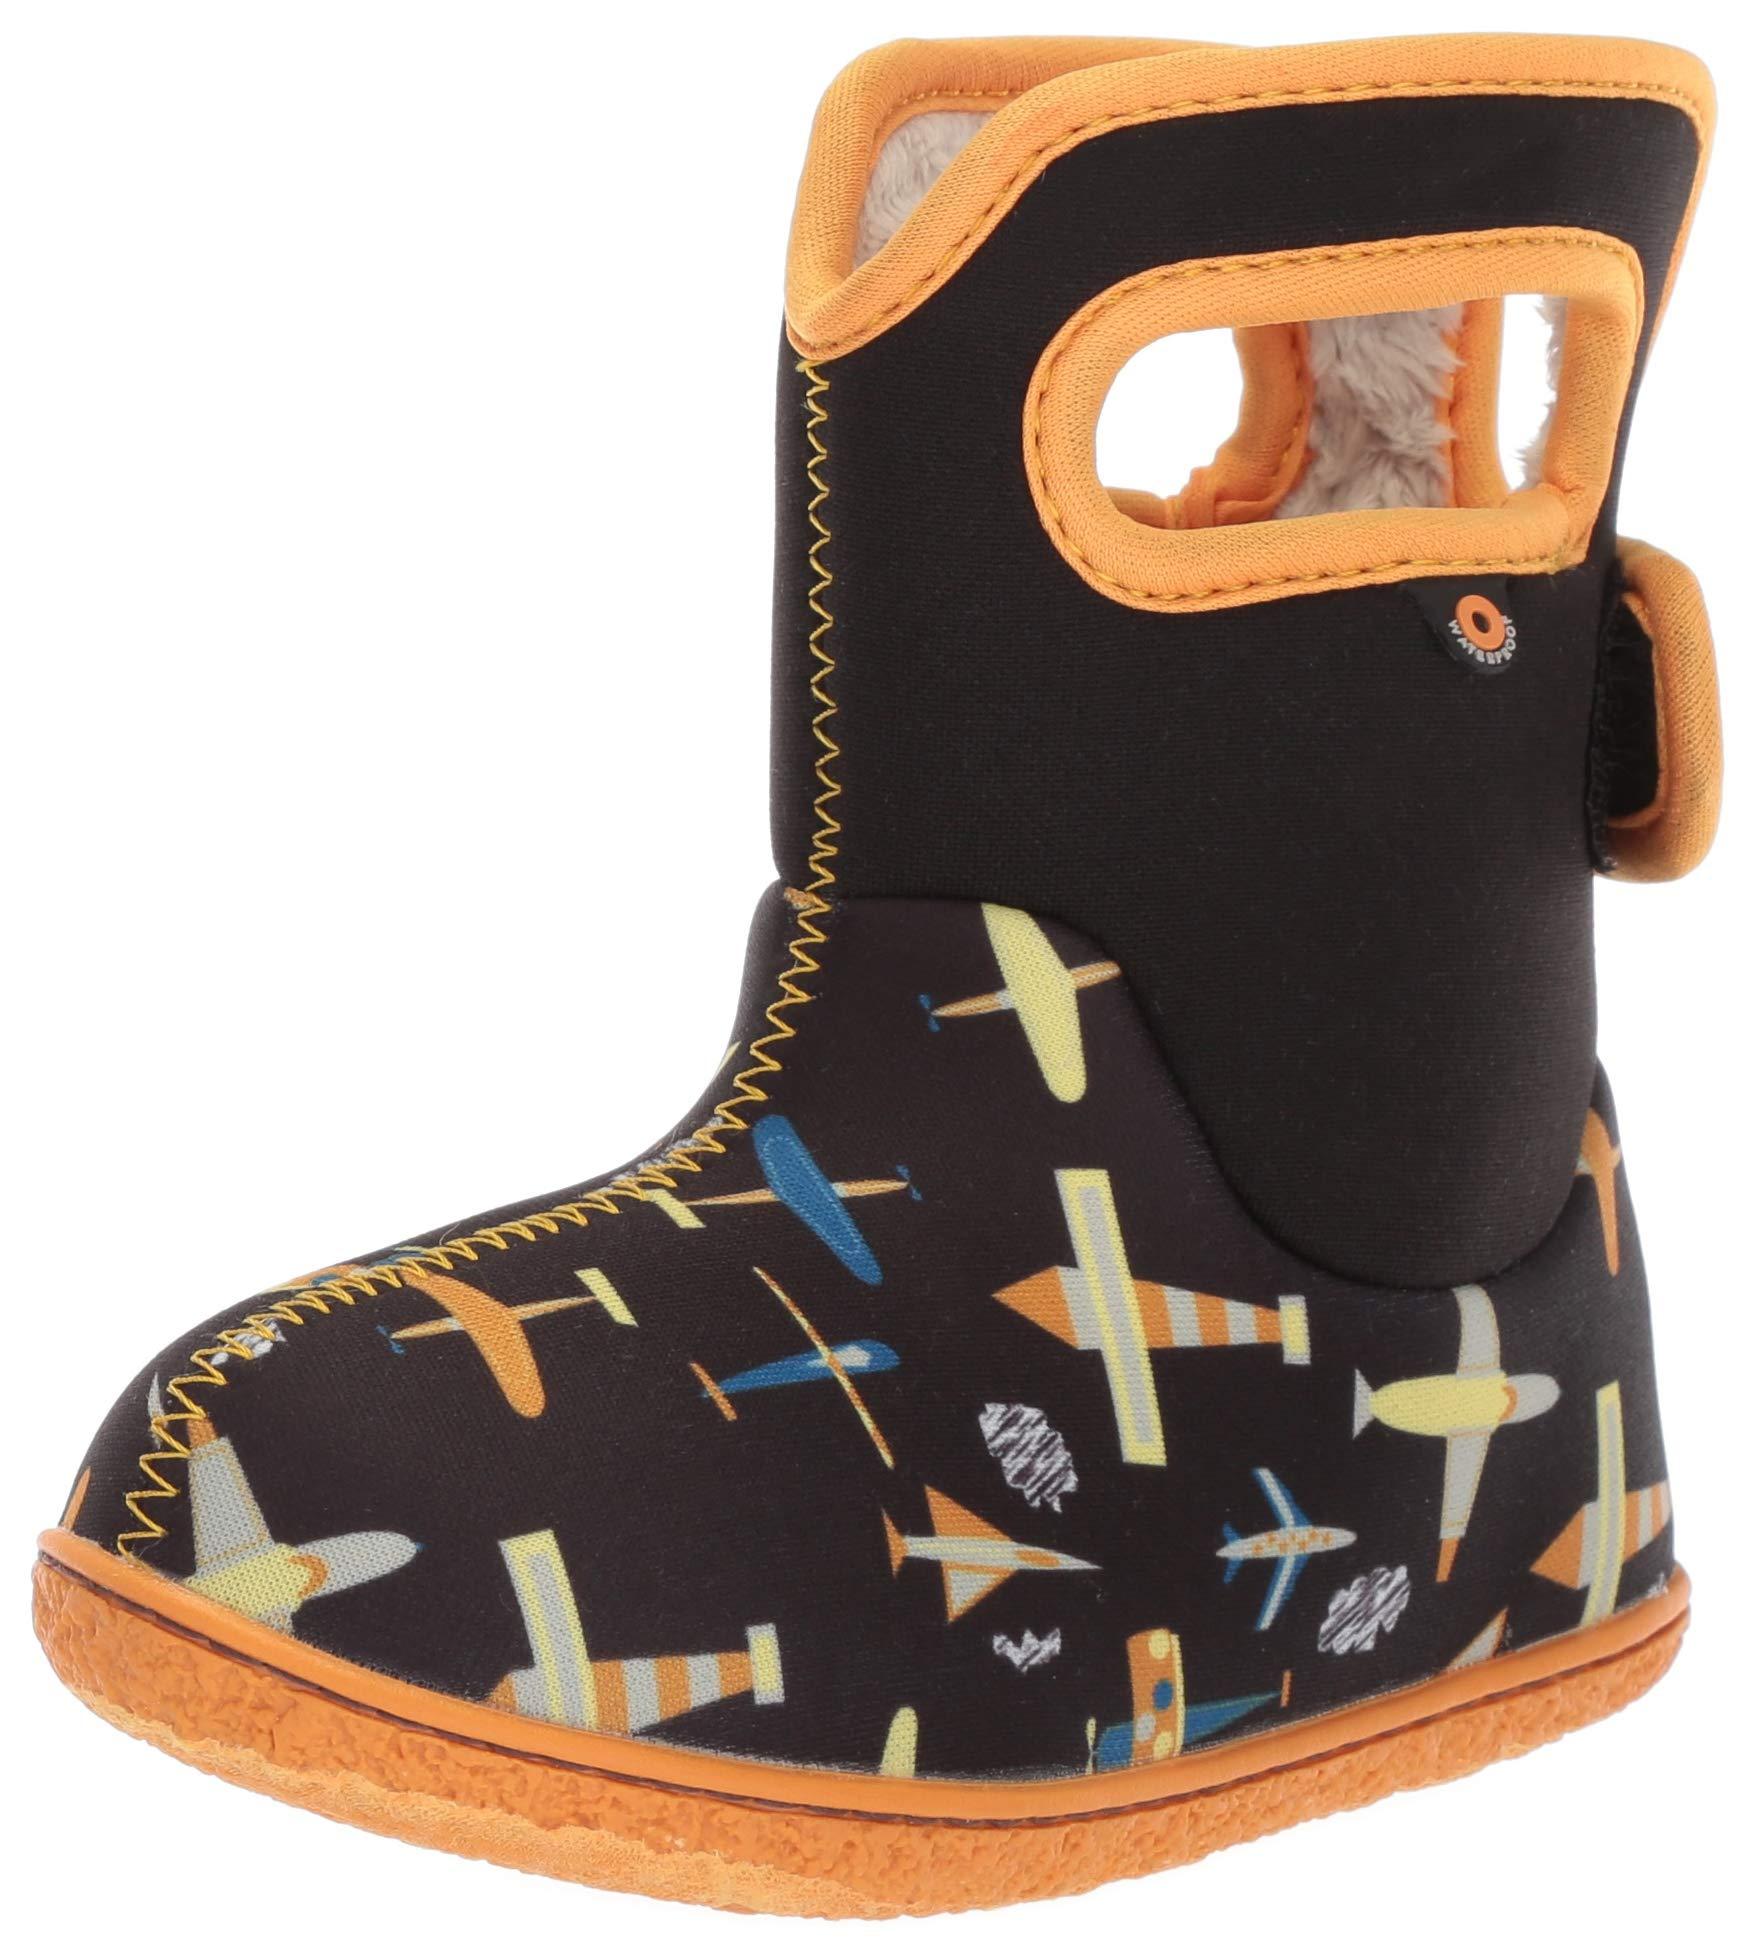 BOGS Baby Snow Boot, Planes Black/Multi, 4 Medium